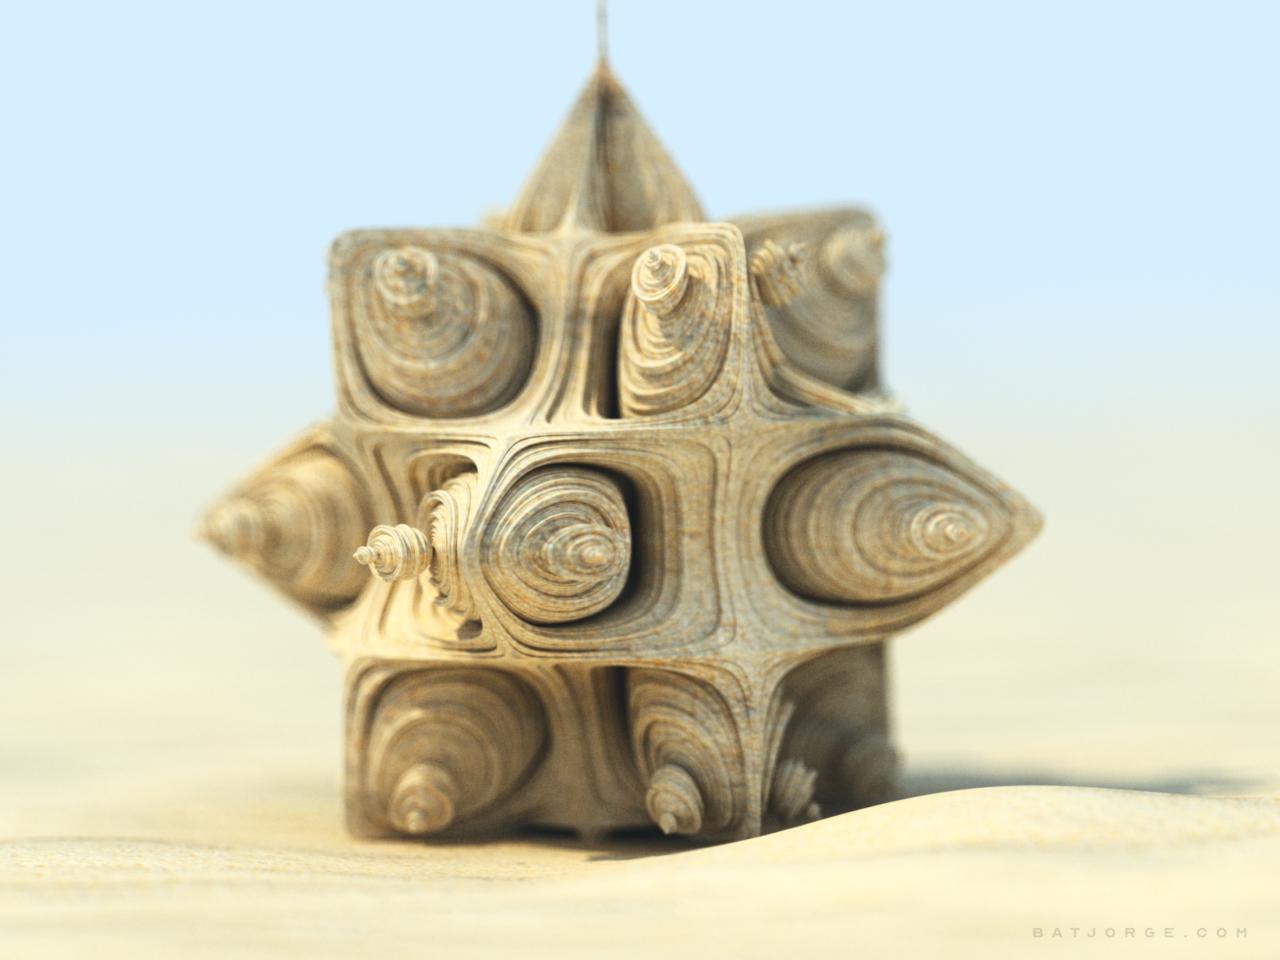 3d fractal figure in a desert. sunny